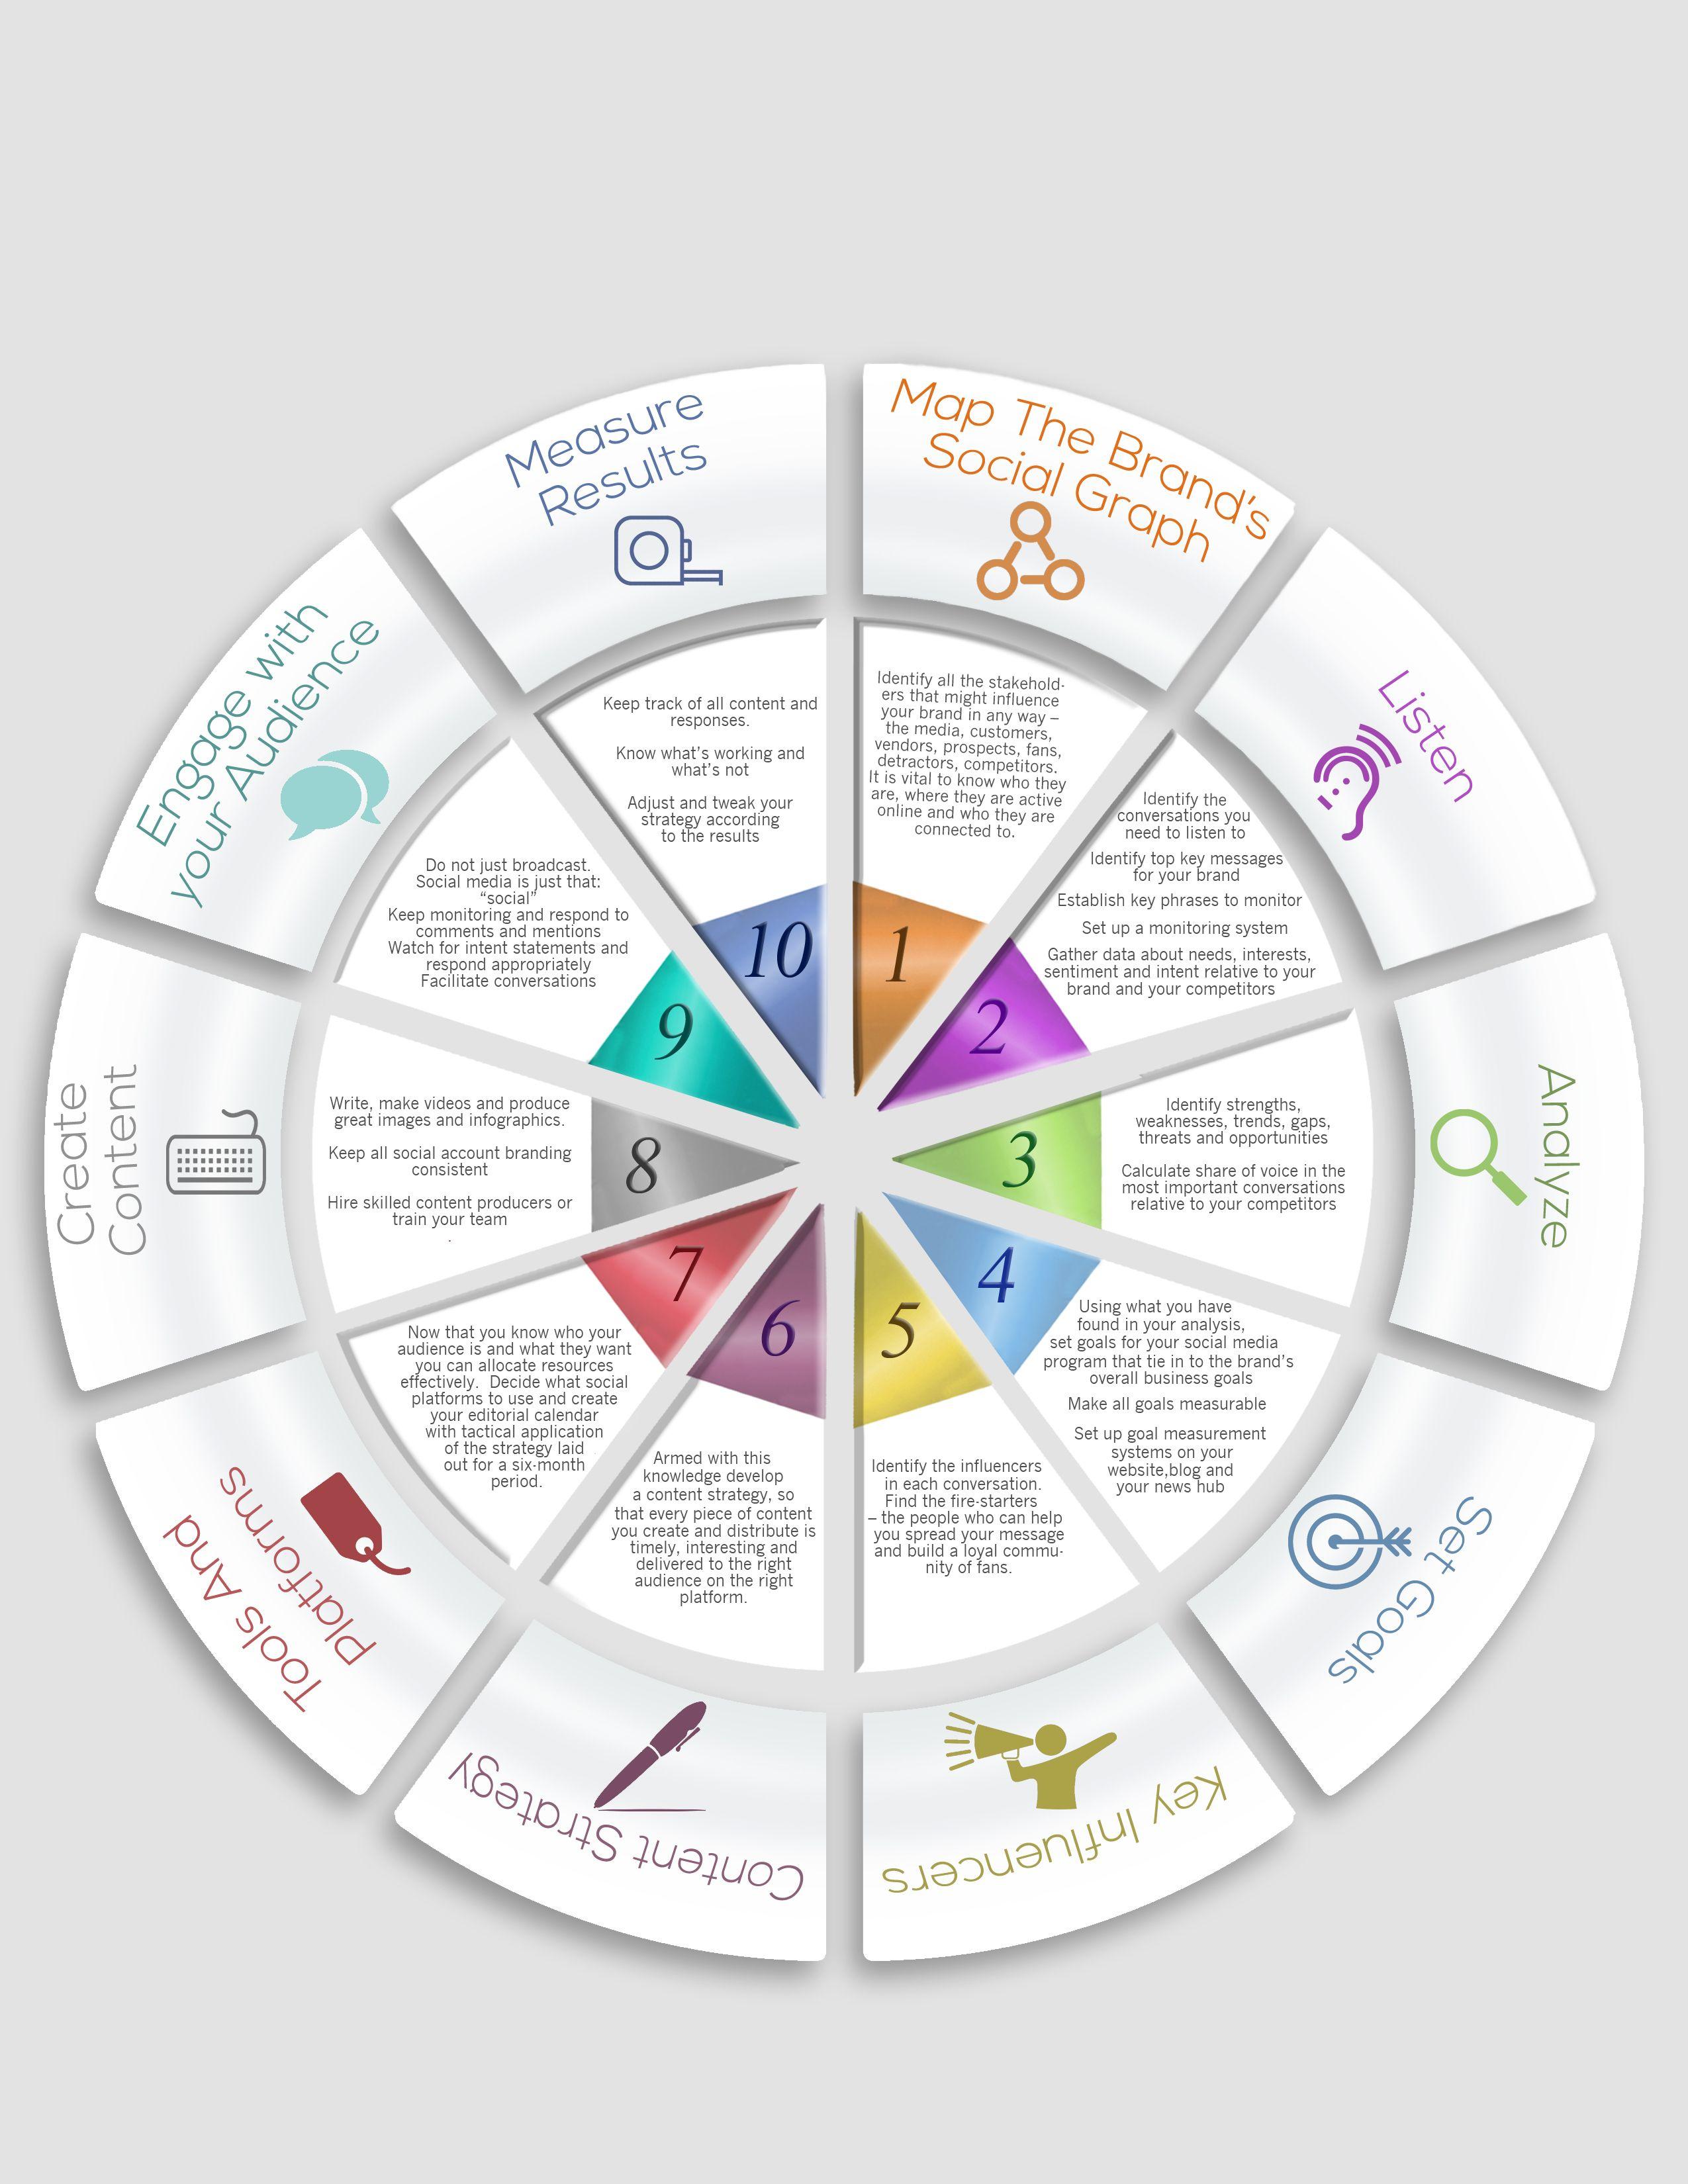 Social Media Strategy Template MarketingStrategy Insight - Social media marketing strategy template